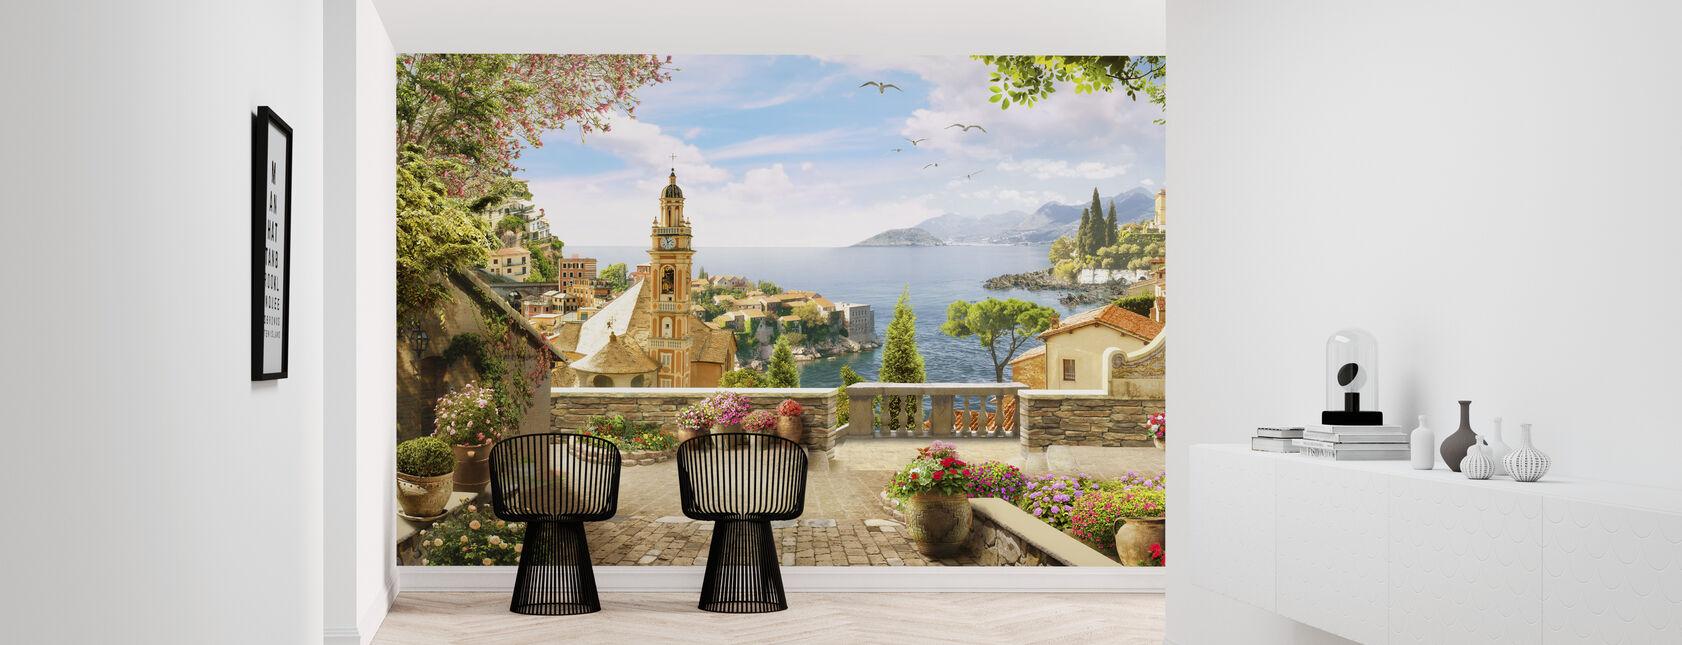 Stunning View of Amalfi - Wallpaper - Hallway